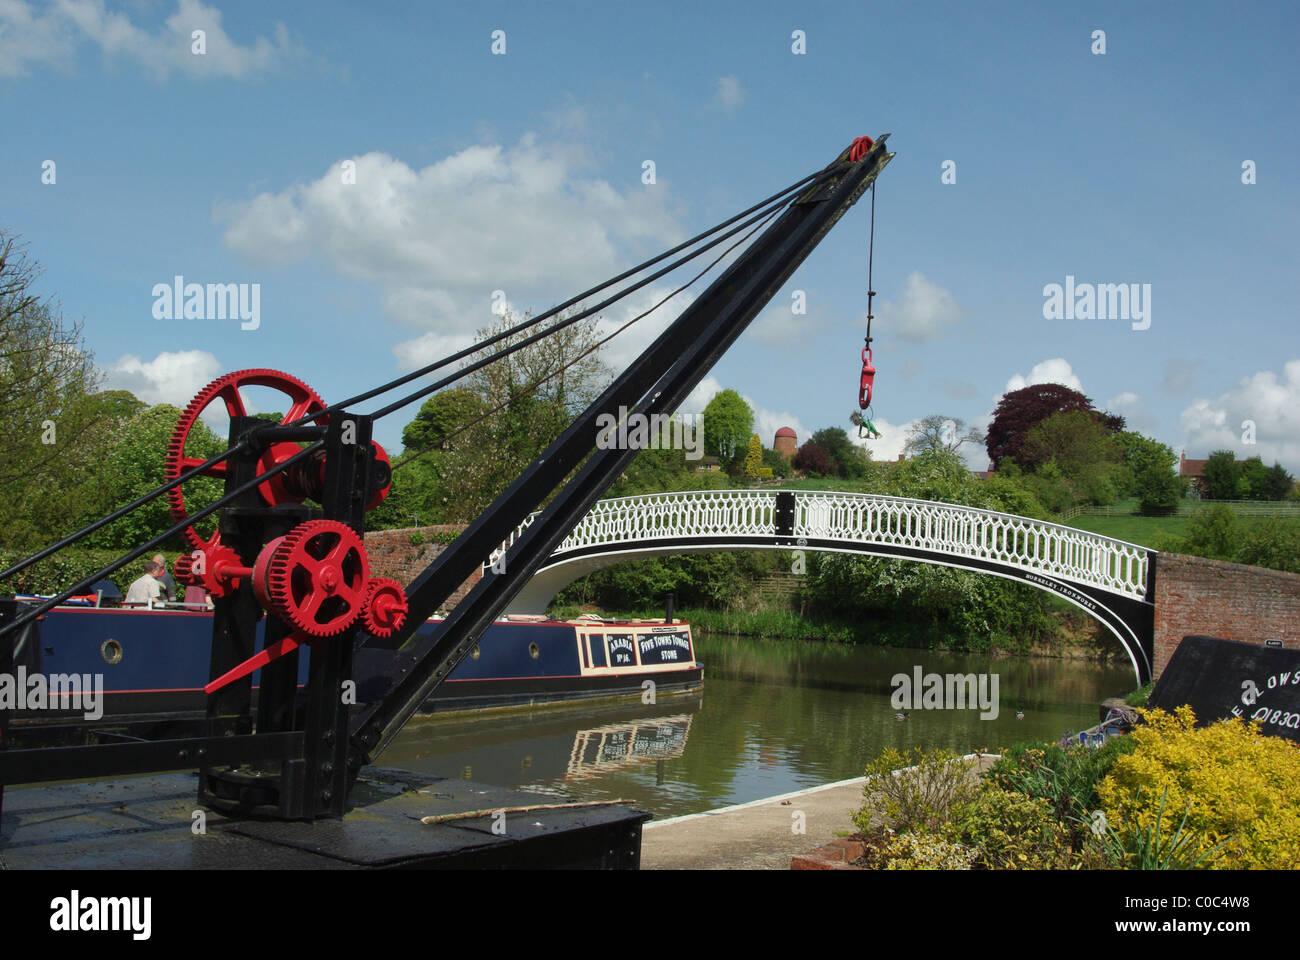 Ornate crane and the roving bridge at Braunston Marina, Northamptonshire, England UK - Stock Image